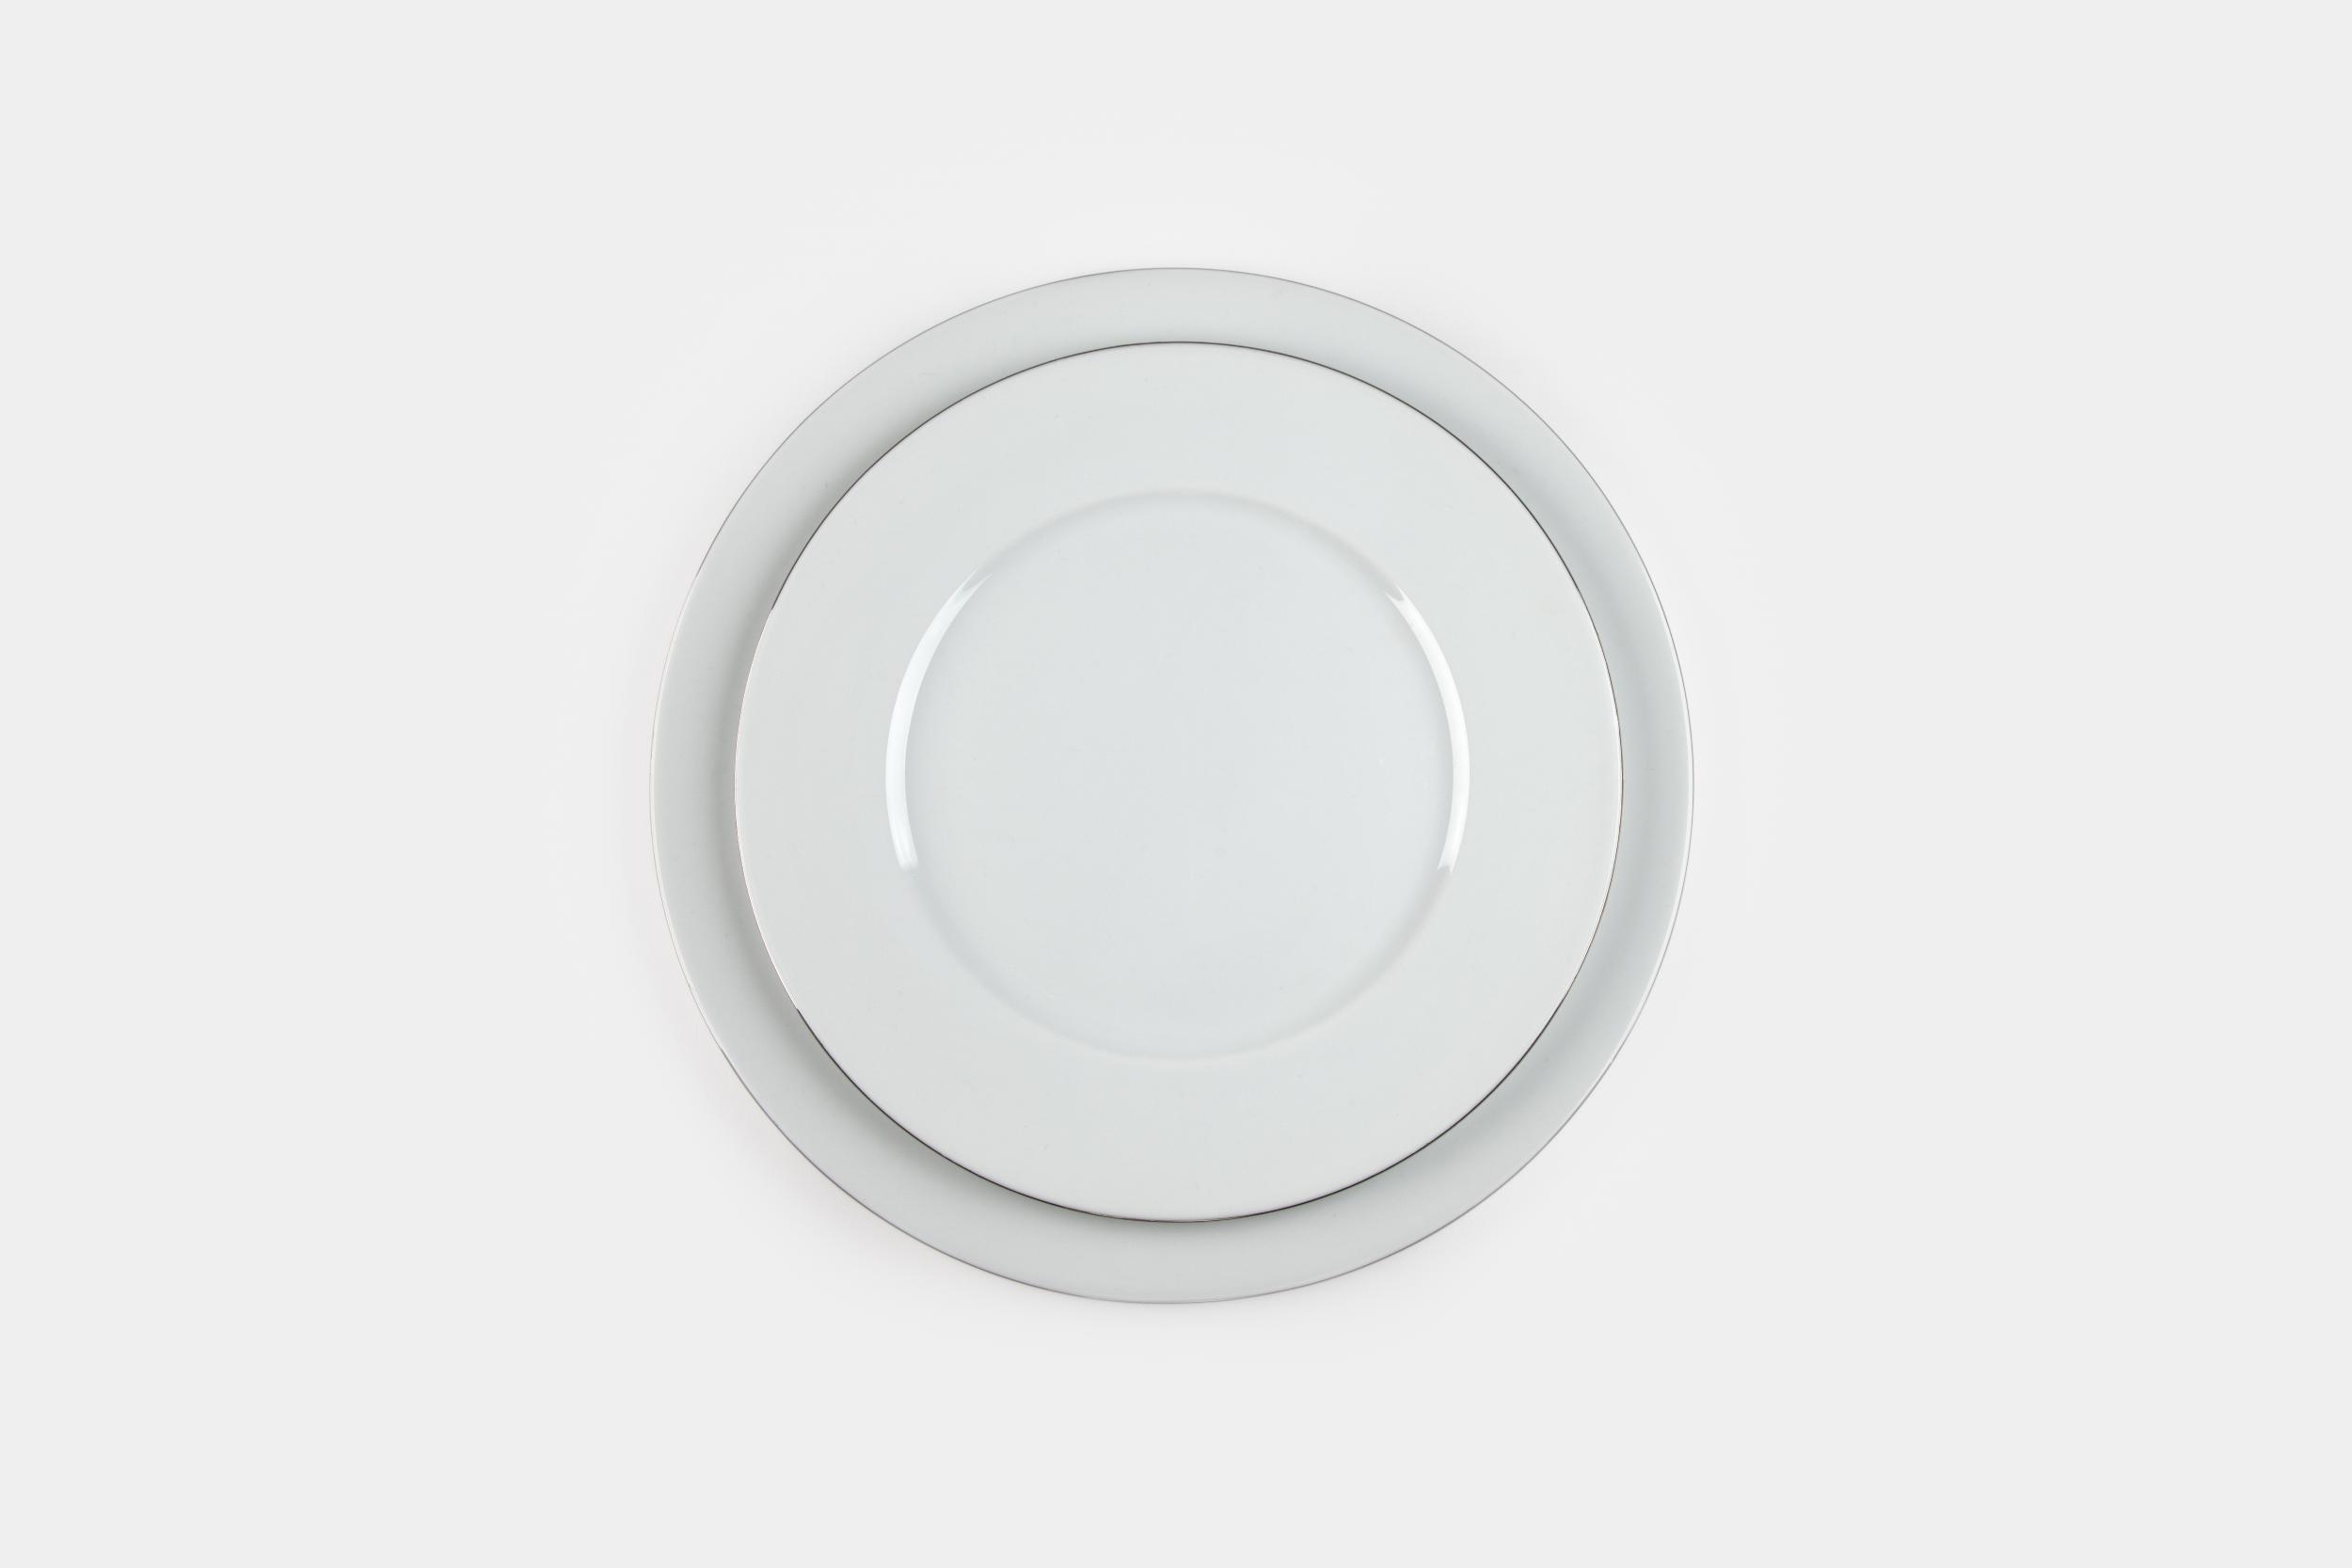 Platine plate set - Image 0